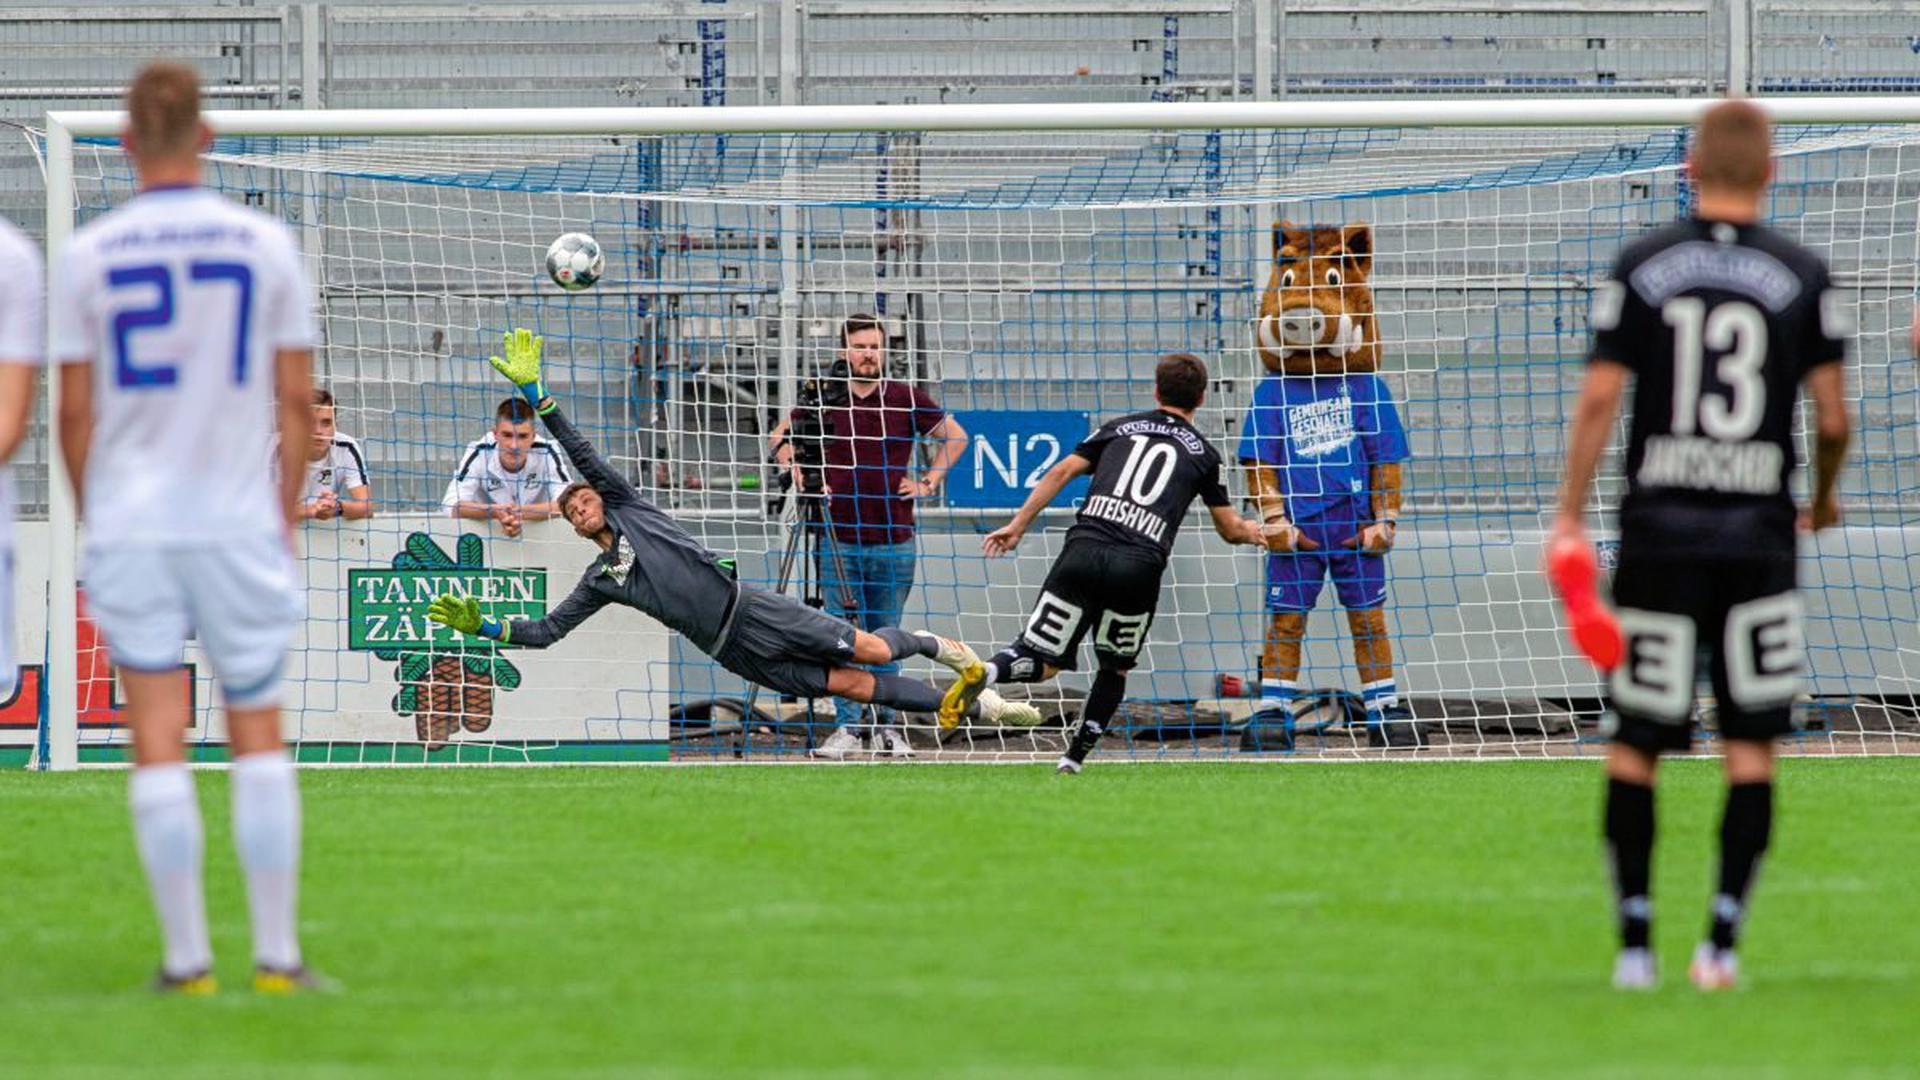 Elfemeterschiessen: Torwart Benjamin Uphoff (KSC) gegen Otar Kiteishvili (SK Sturm Graz)